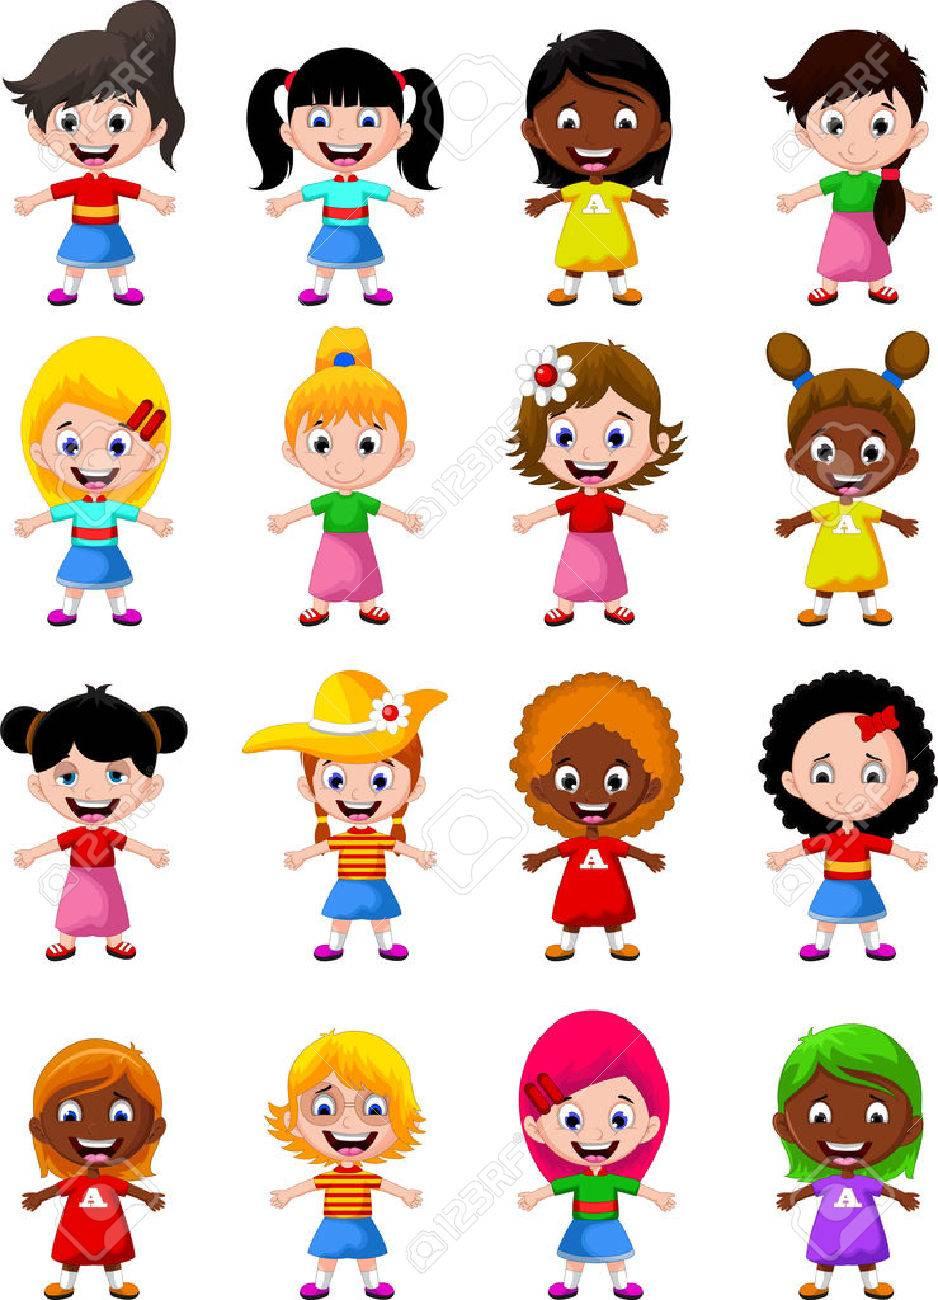 happy girl kids cartoon collection - 41506249